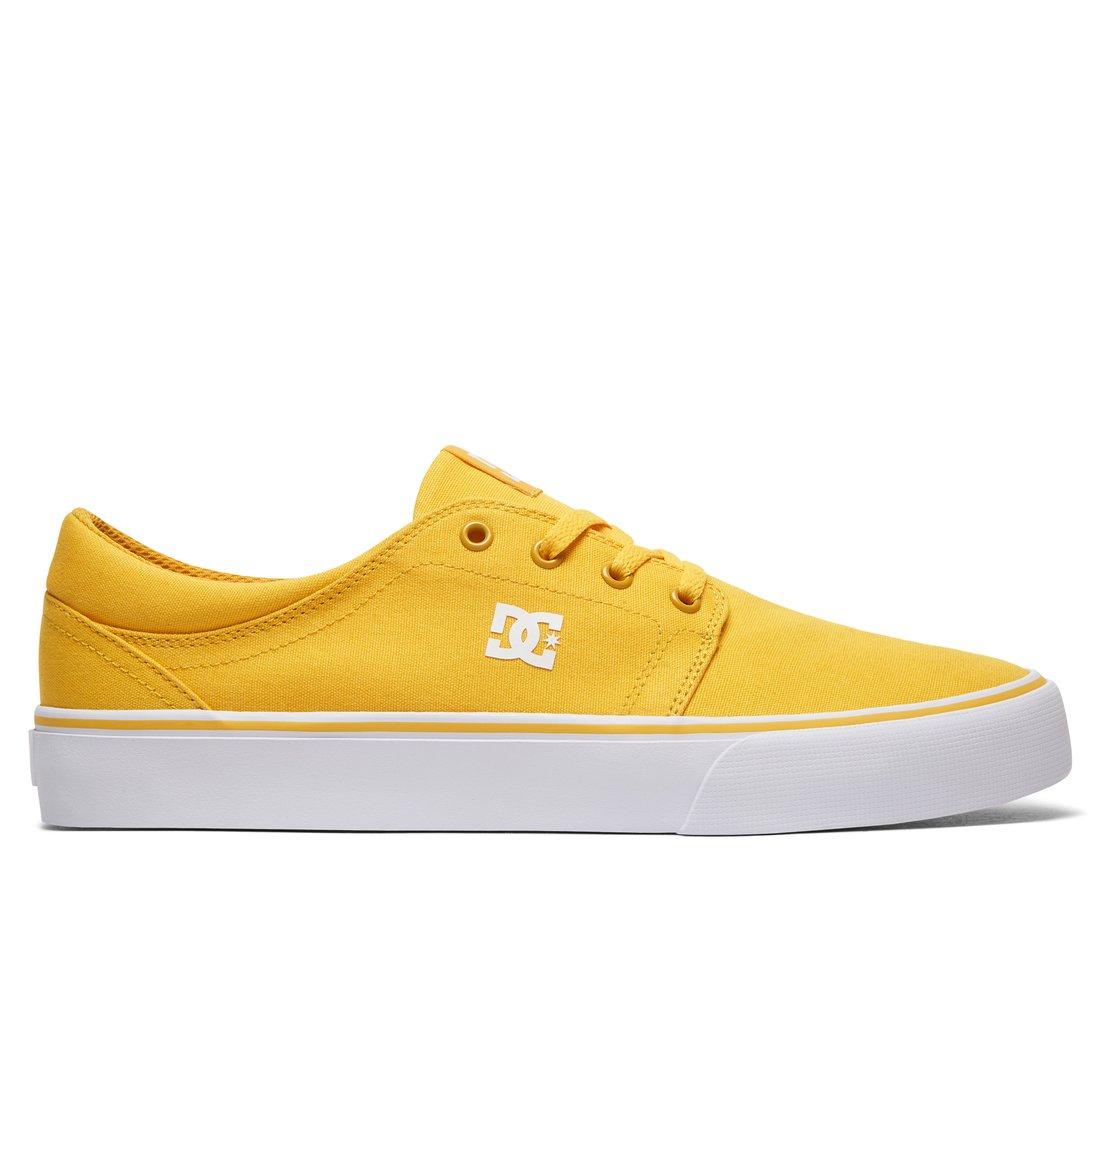 DC Shoes TRASE - Skate shoes - yellow/gold WPS5Xx1fj